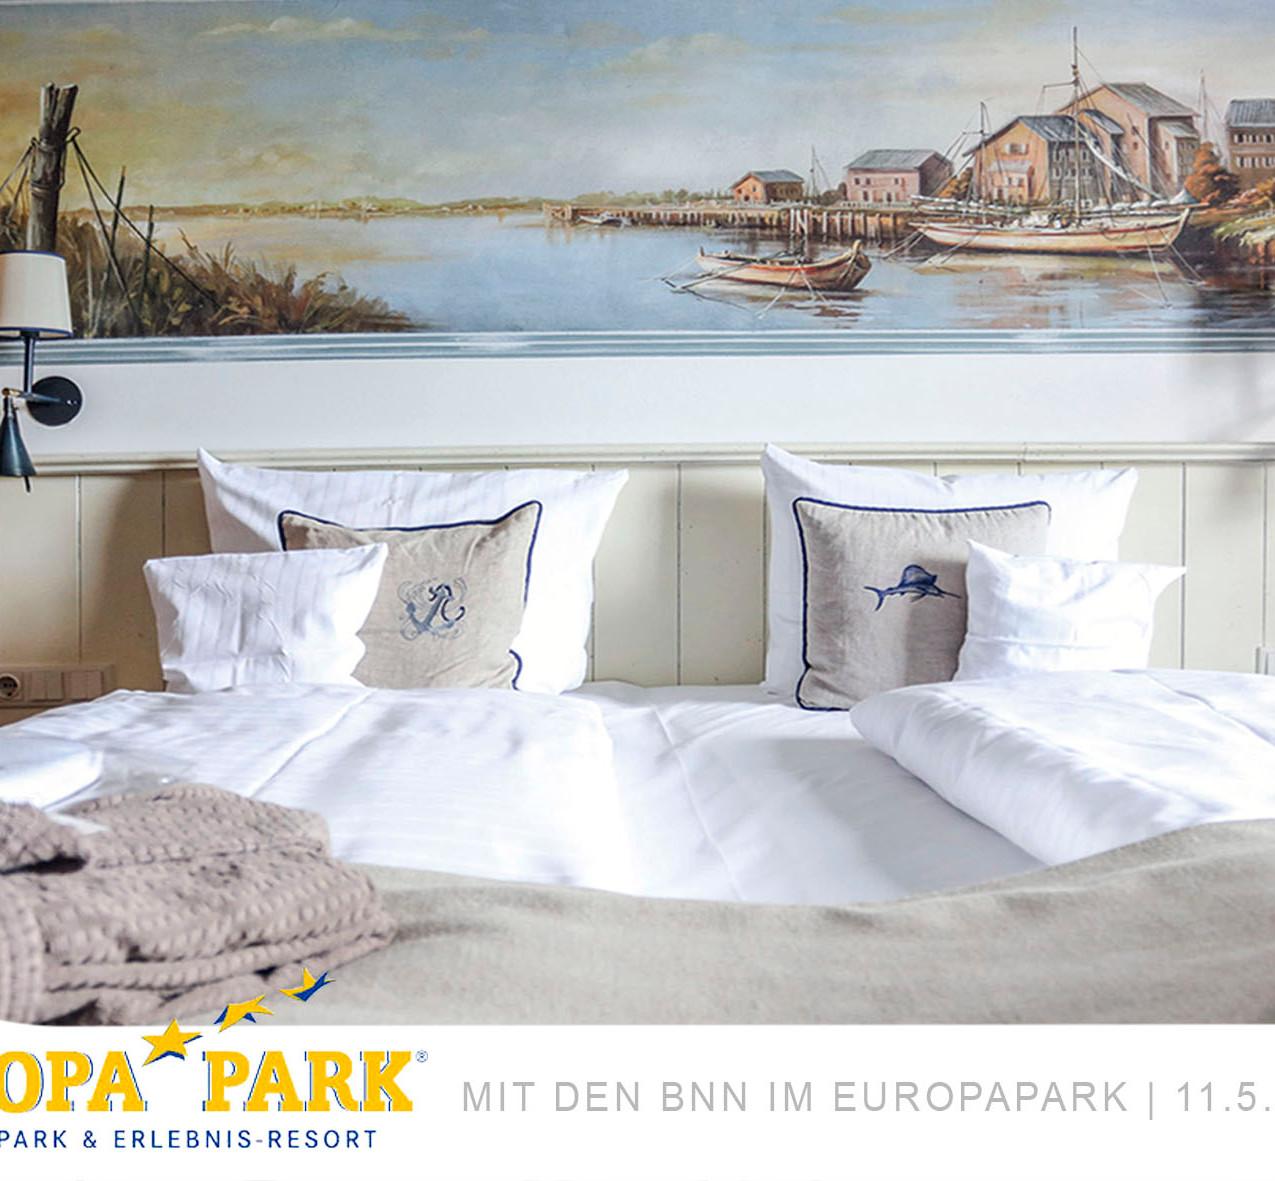 20190510_FB_Europapark_3